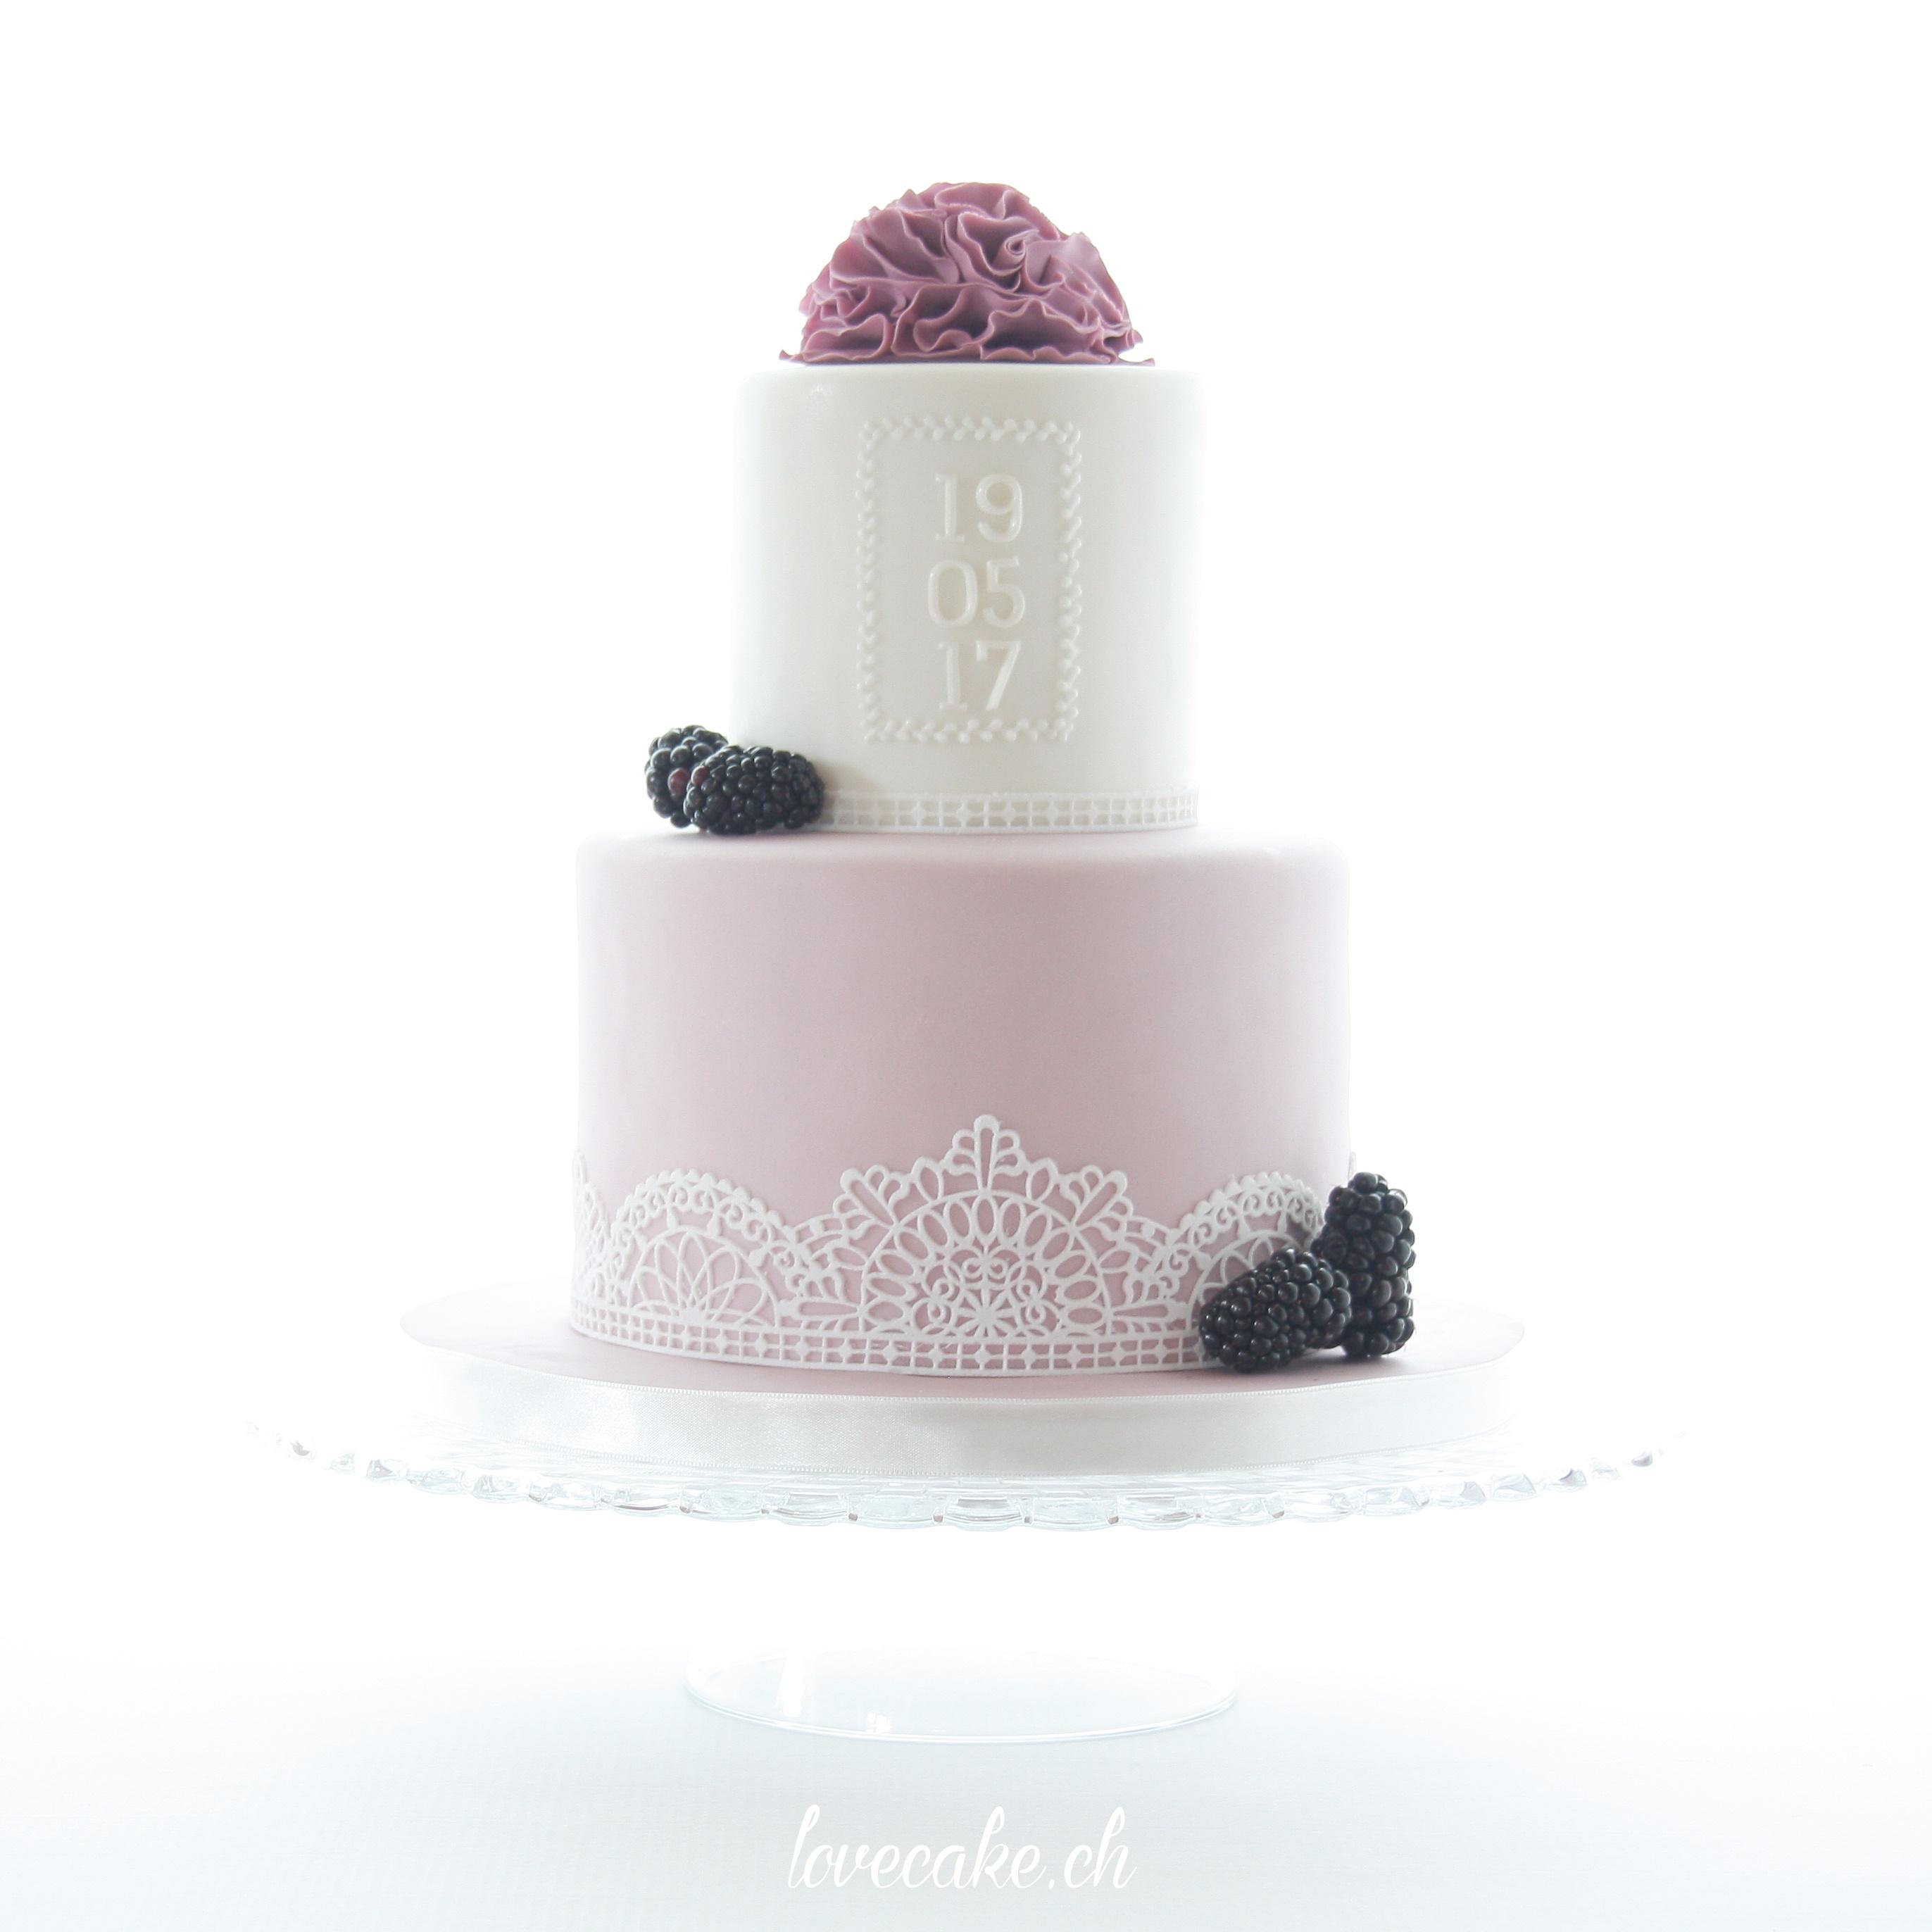 Lavender white fondant lace wedding cake with gum paste flowers